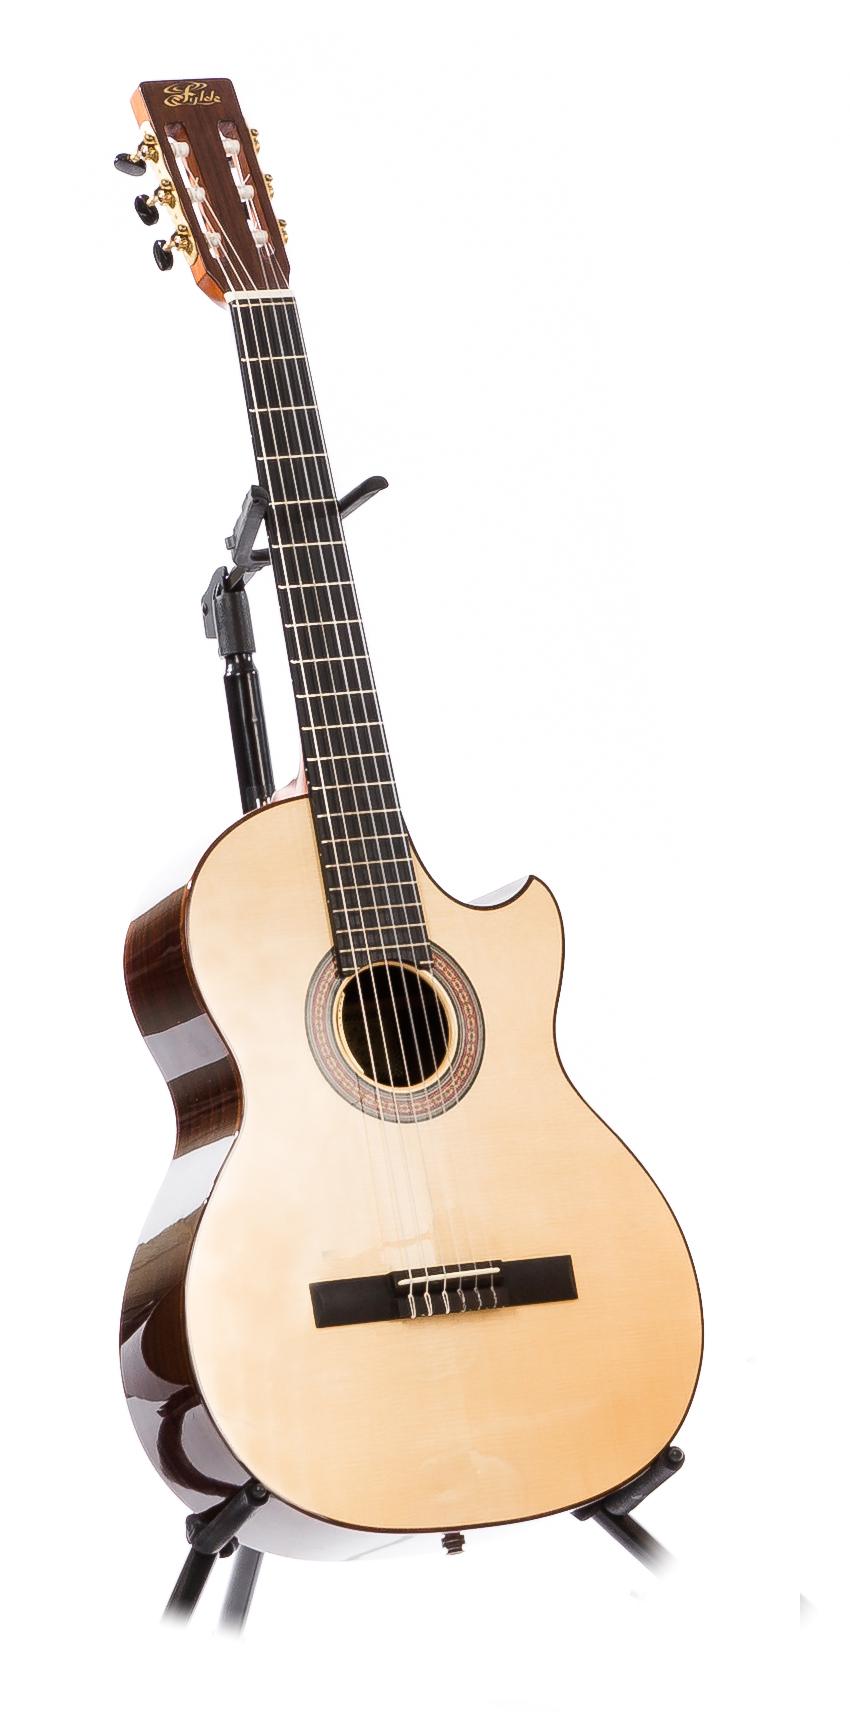 Fylde Custom Classic - Top: Englemann SpruceBack & Sides: Indian RosewoodPickup: LR Baggs Anthem